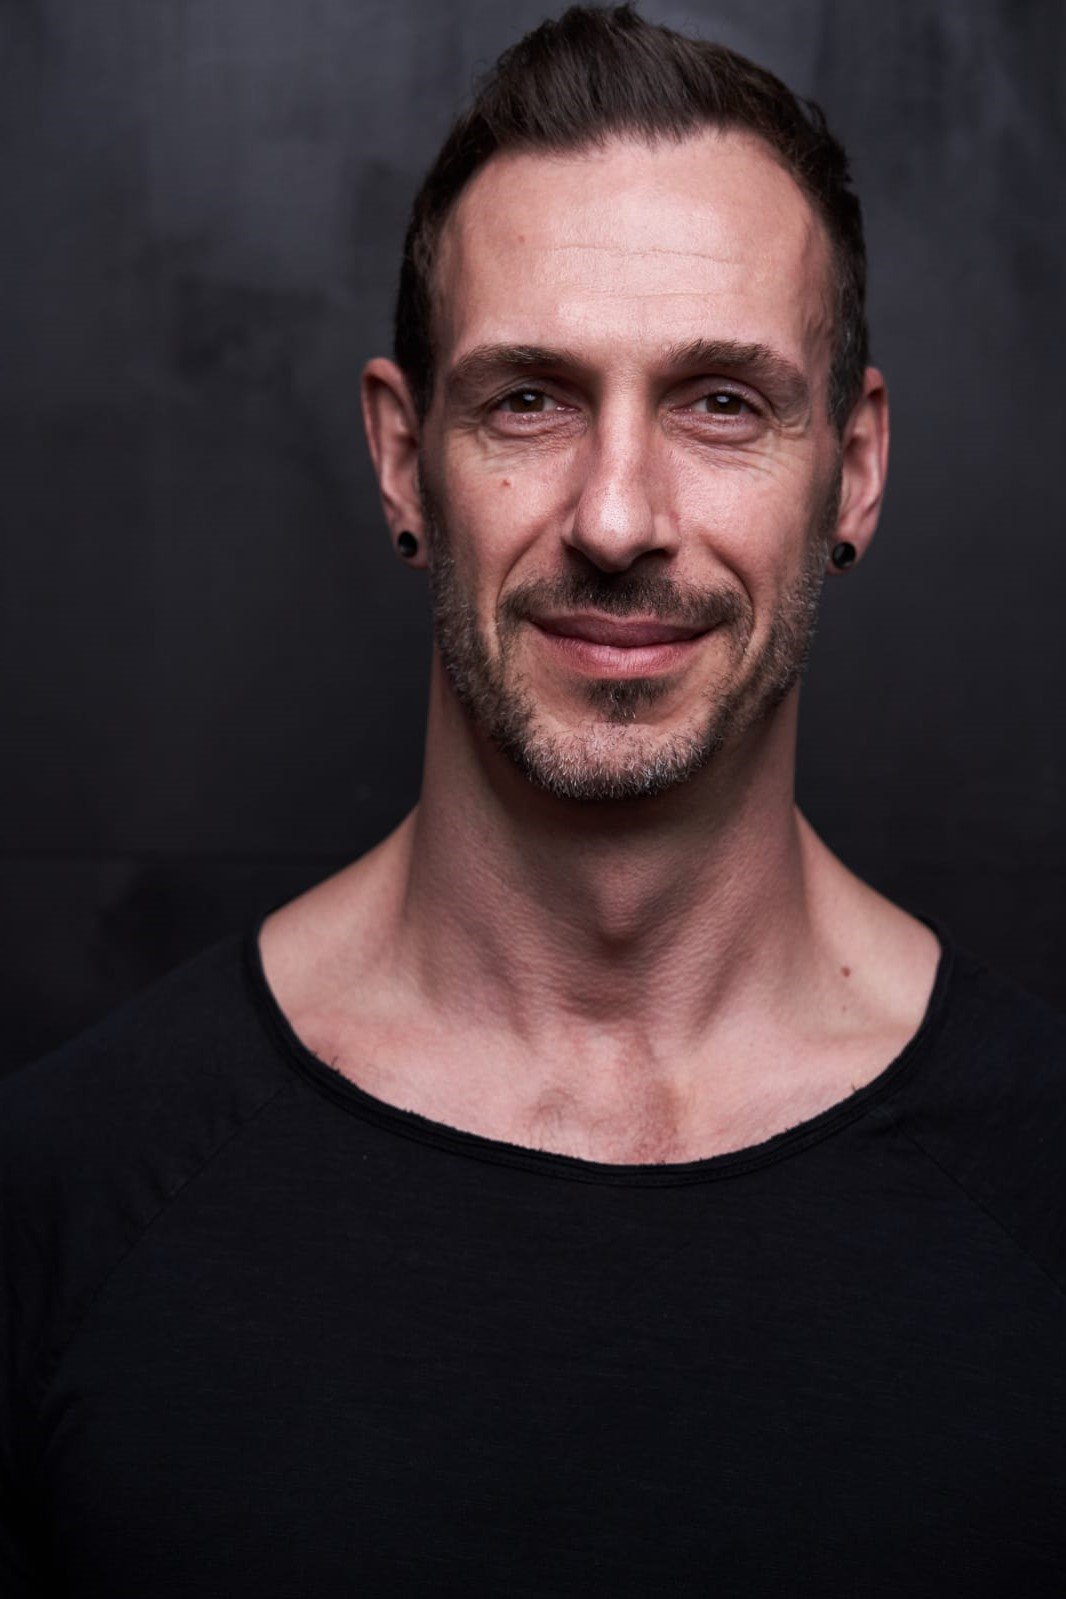 Personal Trainer Thomas Ricks Hamburg